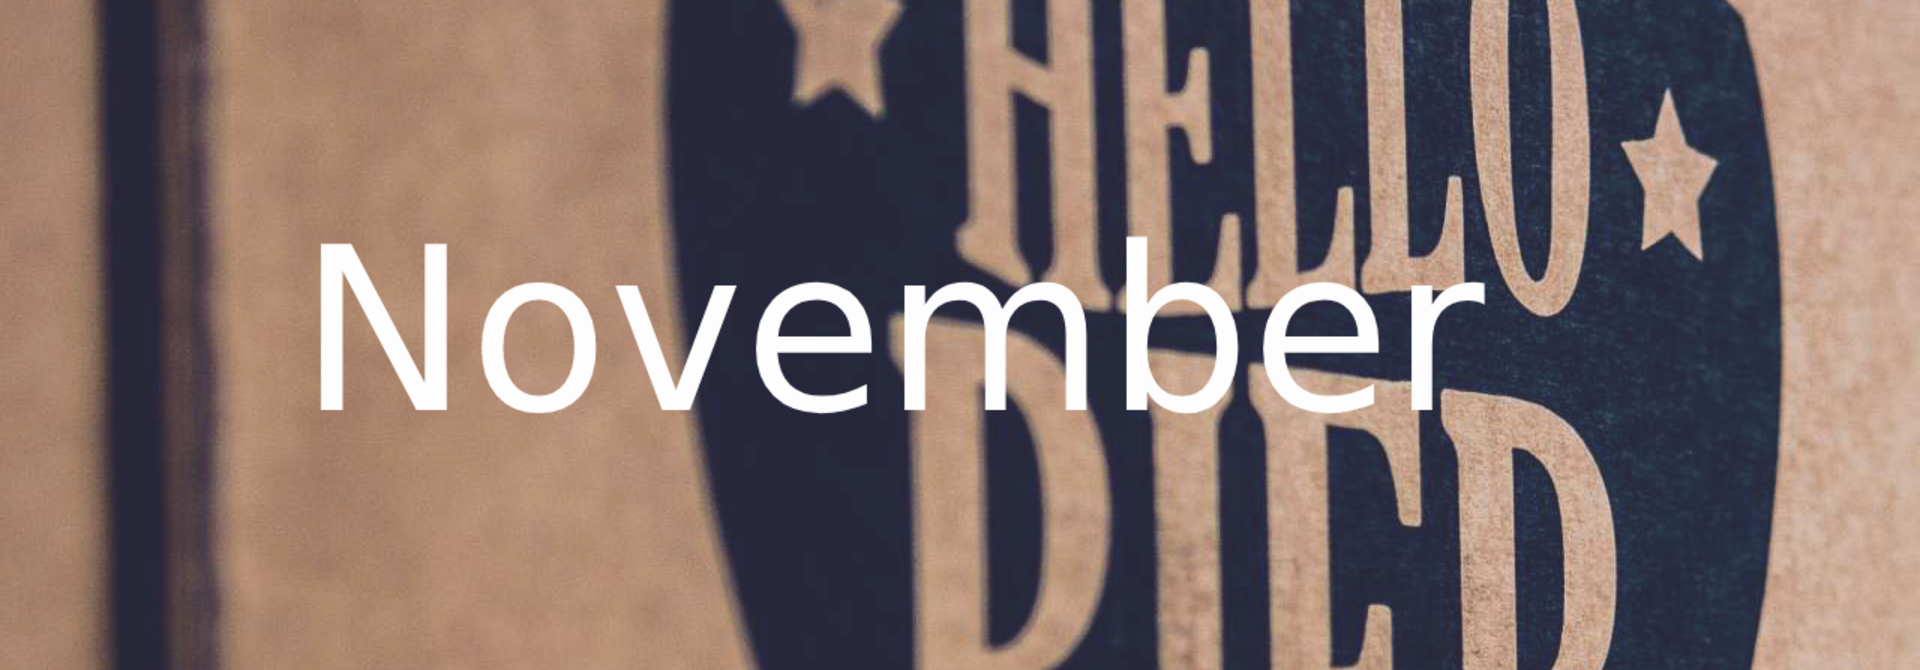 Speciaalbier – bierpakket november 2018